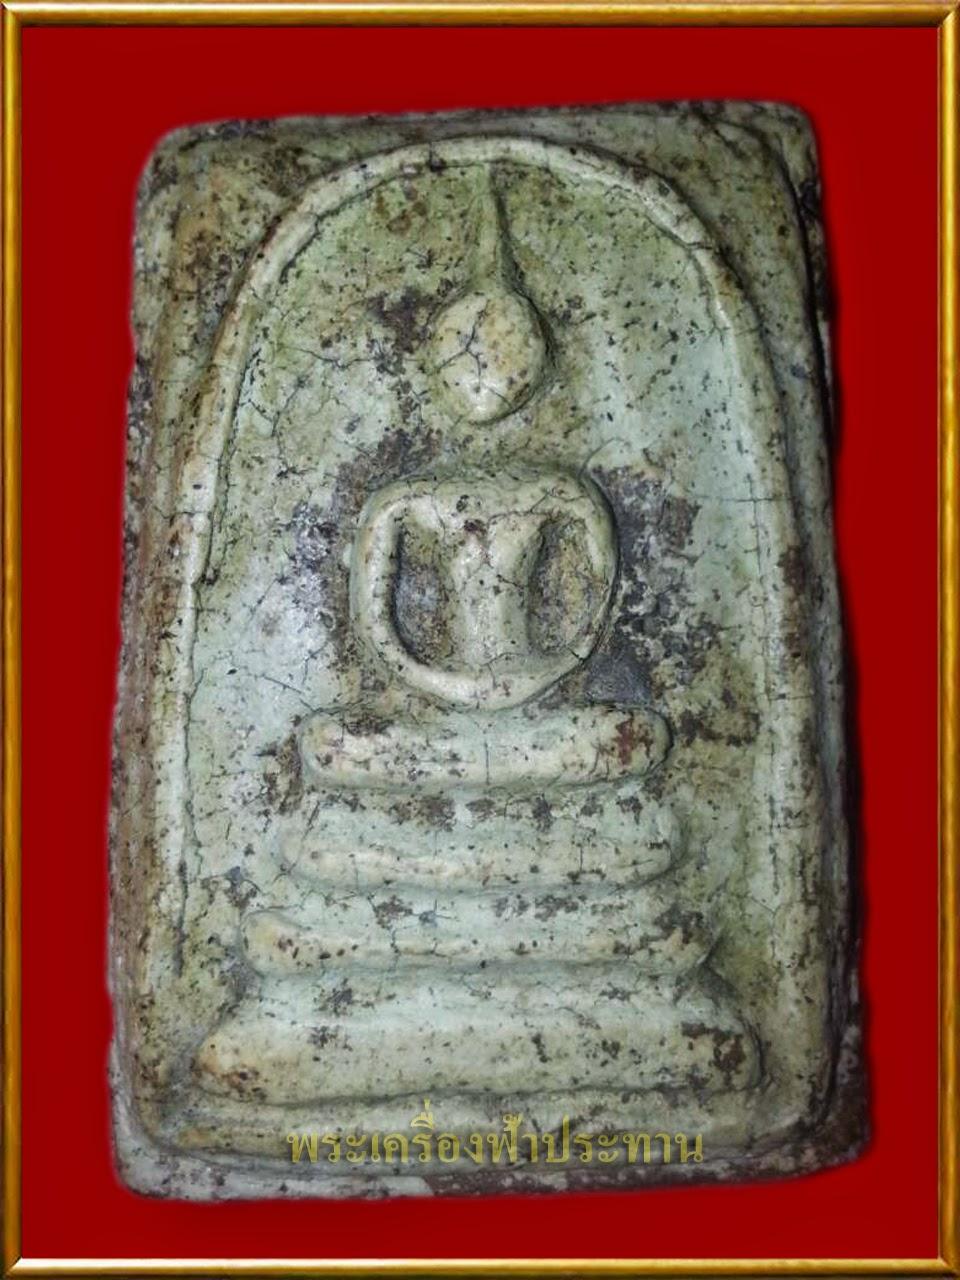 http://tubtimthong-amulet.blogspot.com/2014/11/blog-post_9.html